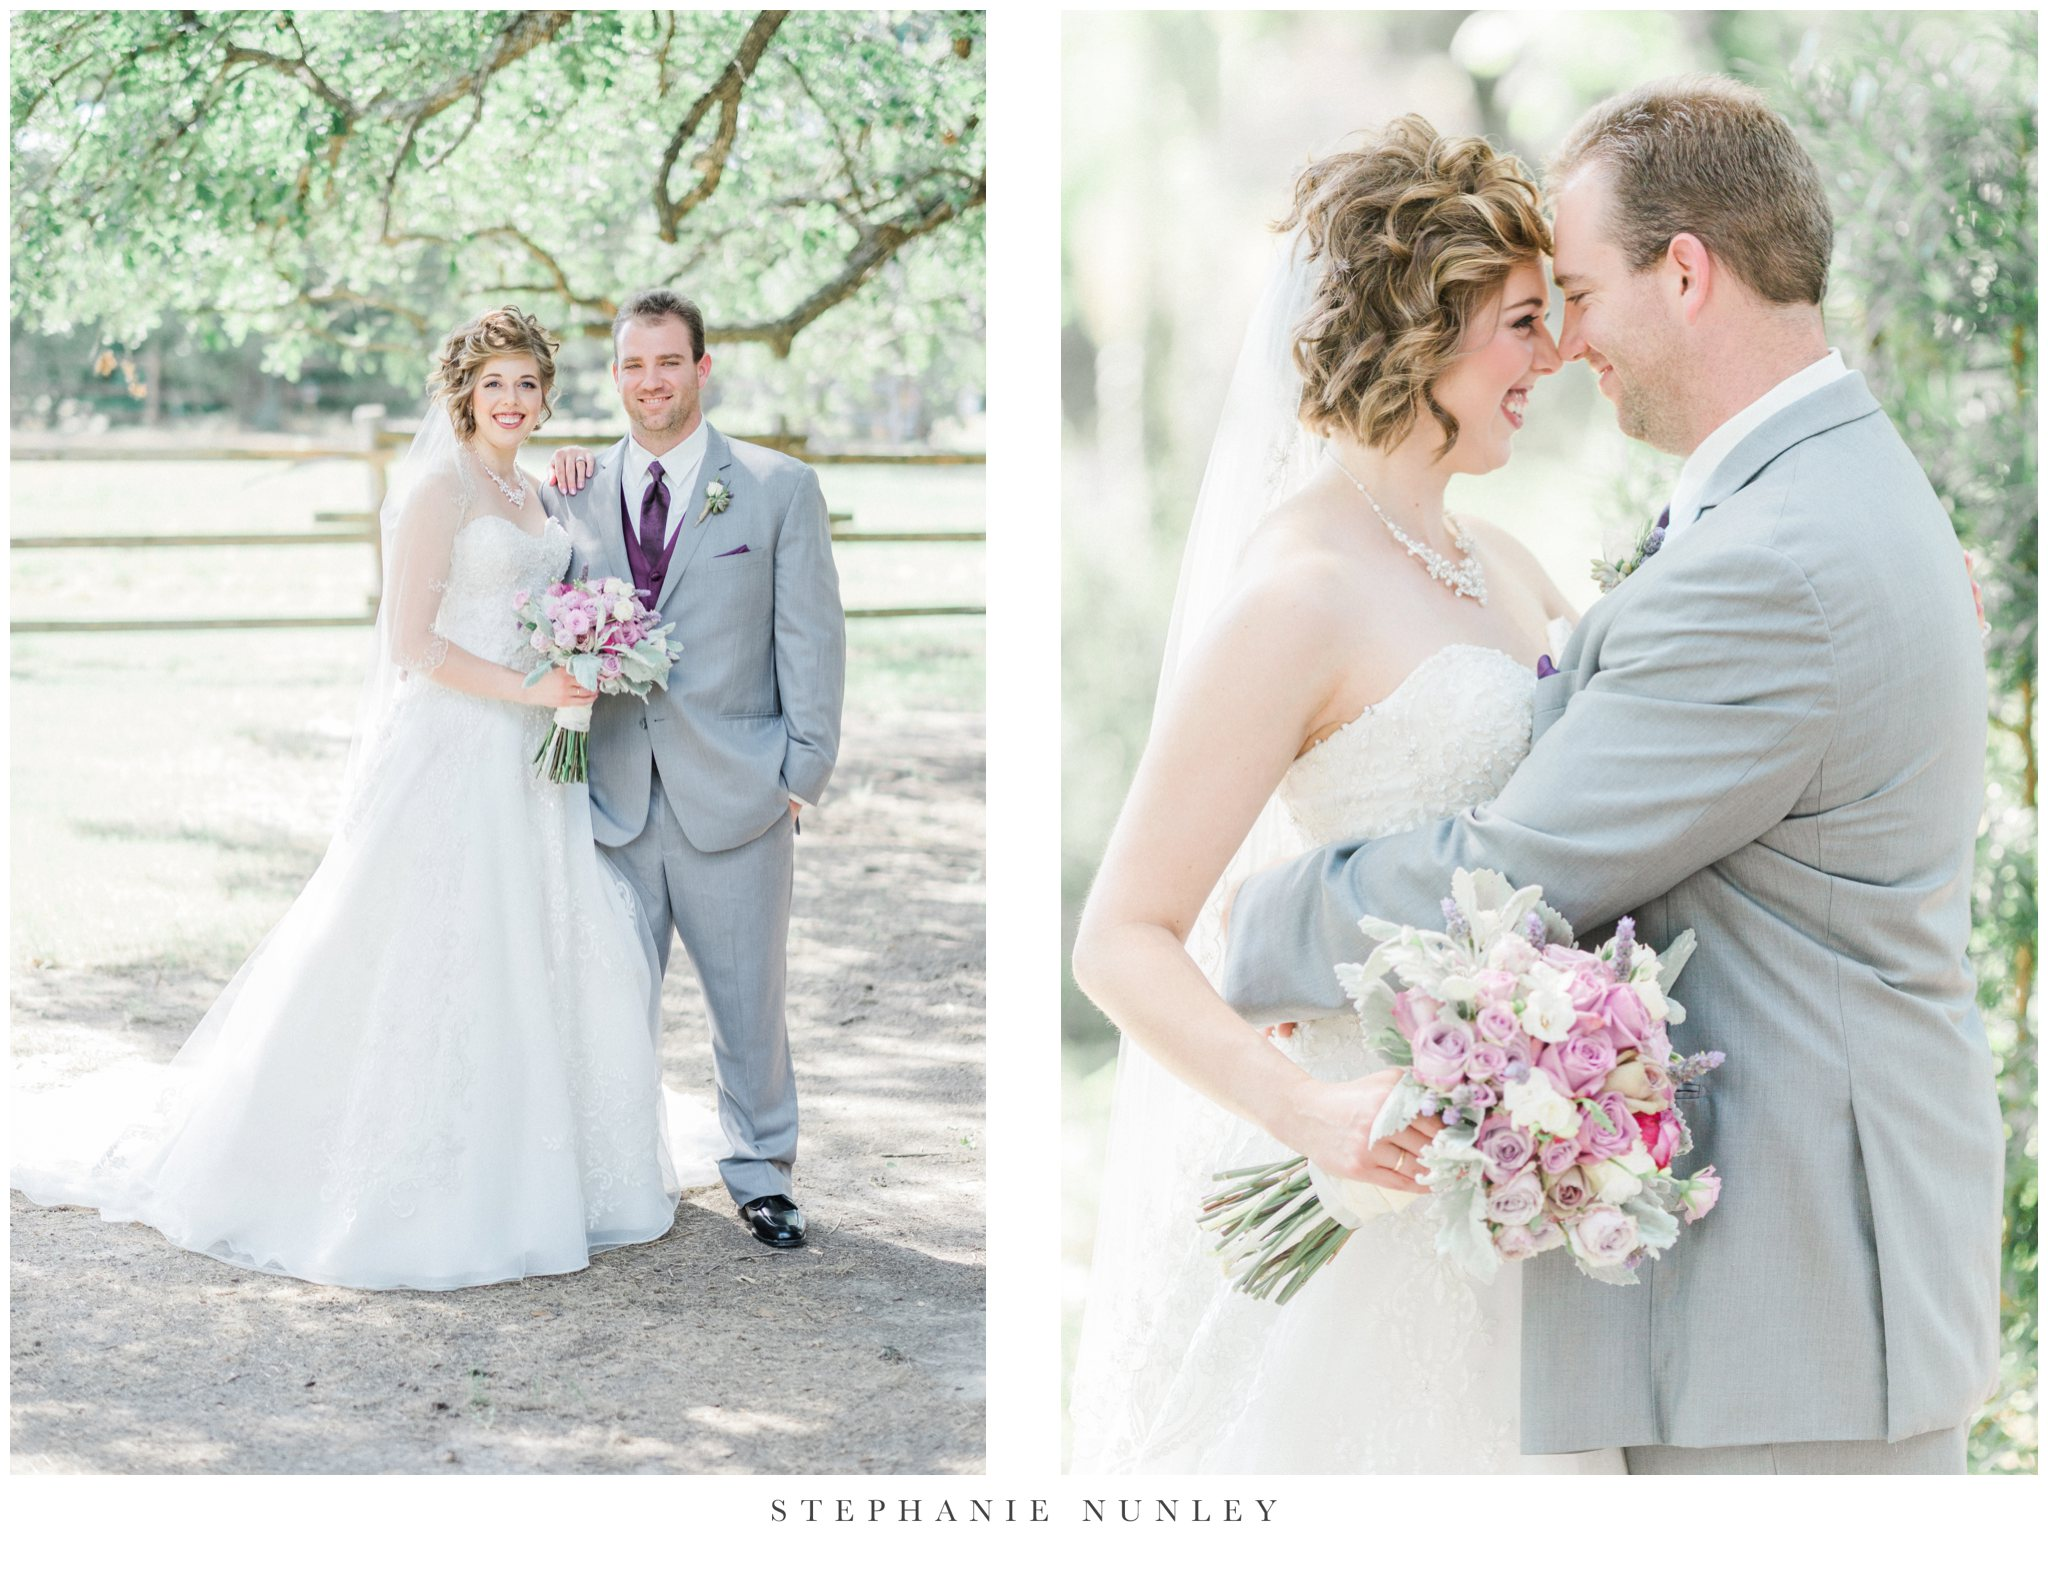 southern-classy-outdoor-barn-wedding-photos-0048.jpg